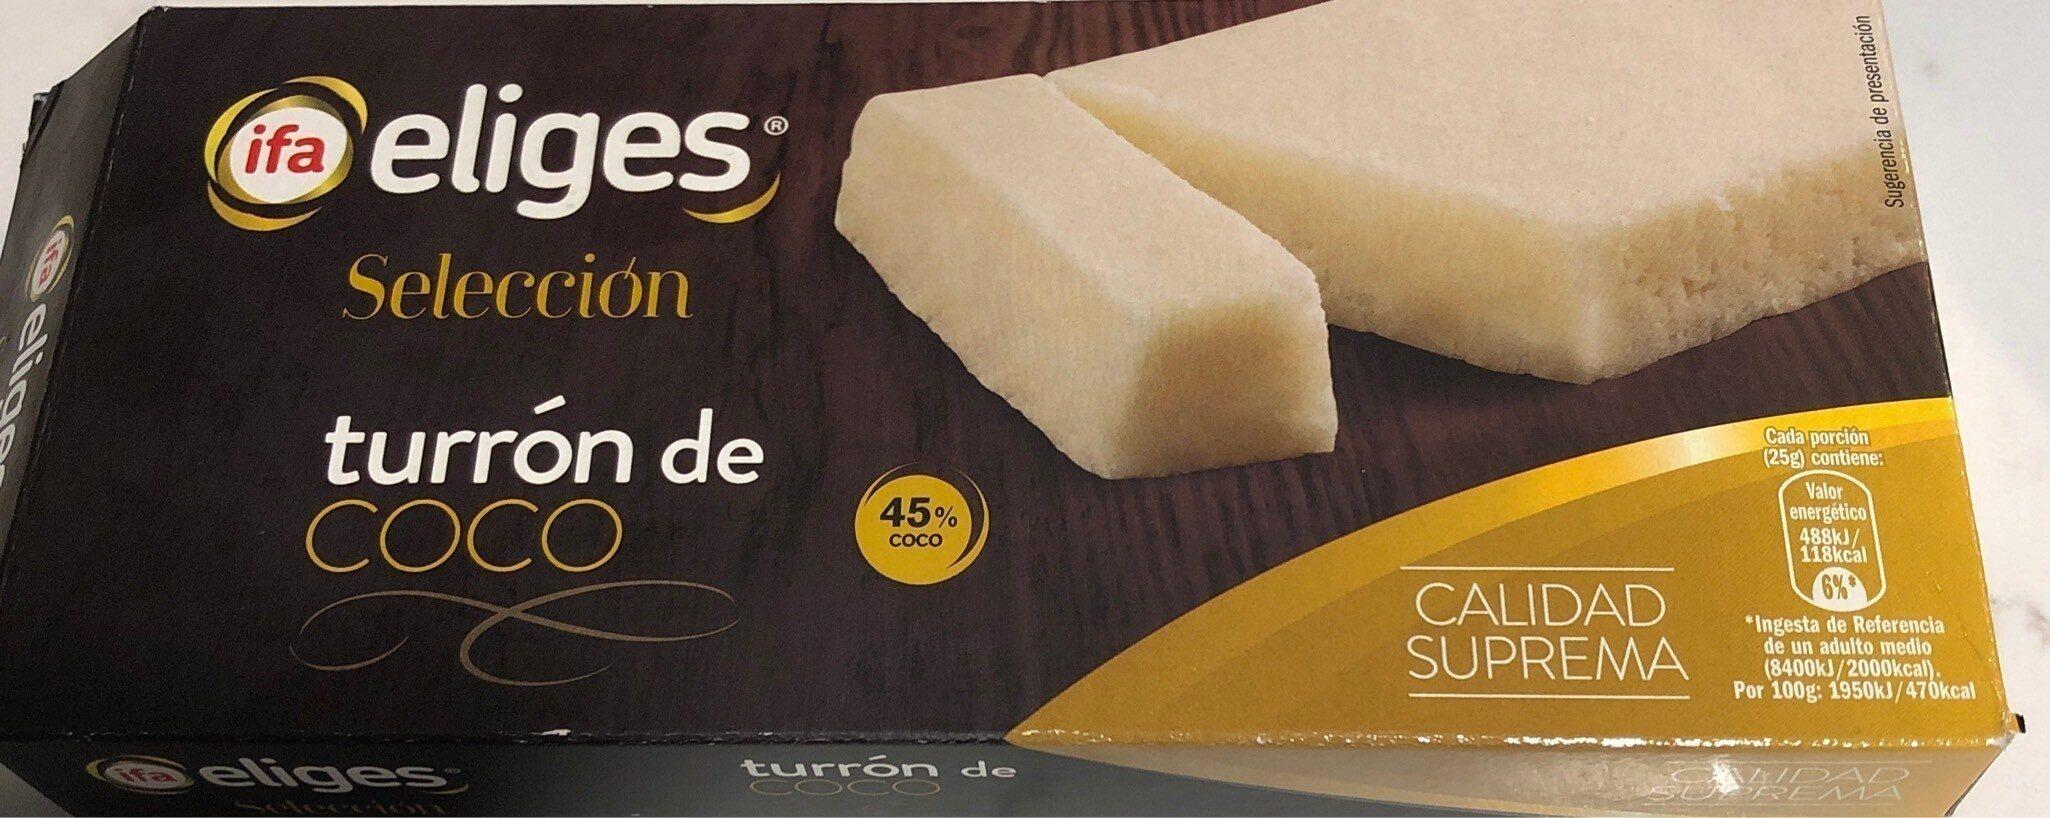 Turron coco ifa eliges - Product - es